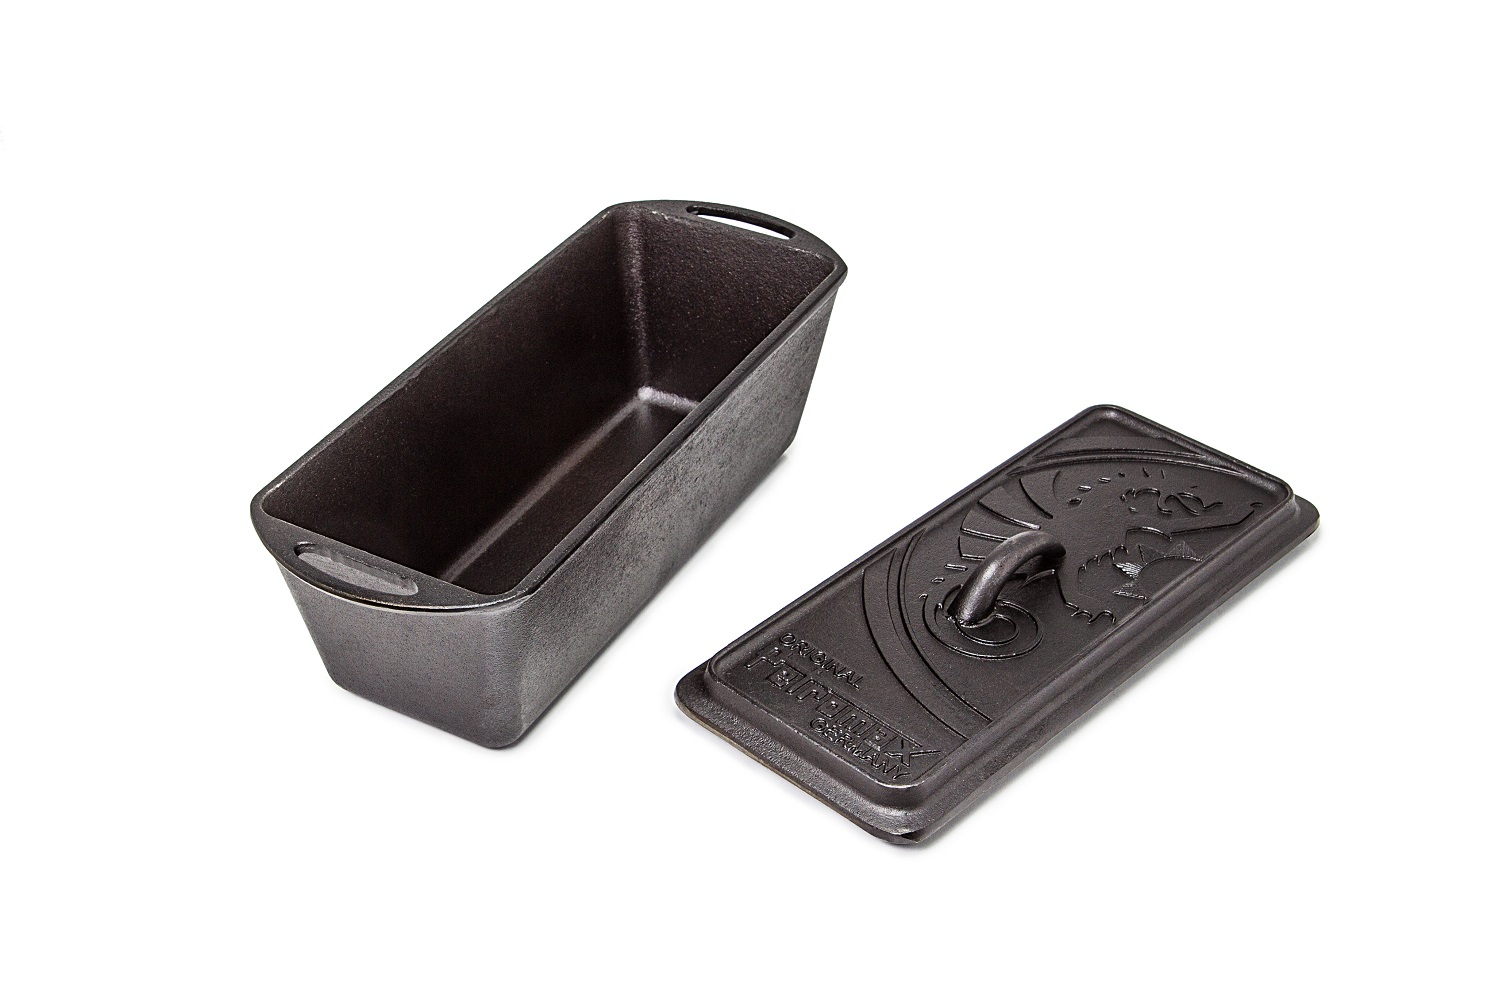 petromax kastenform k4 dutch oven braten brot kuchen. Black Bedroom Furniture Sets. Home Design Ideas